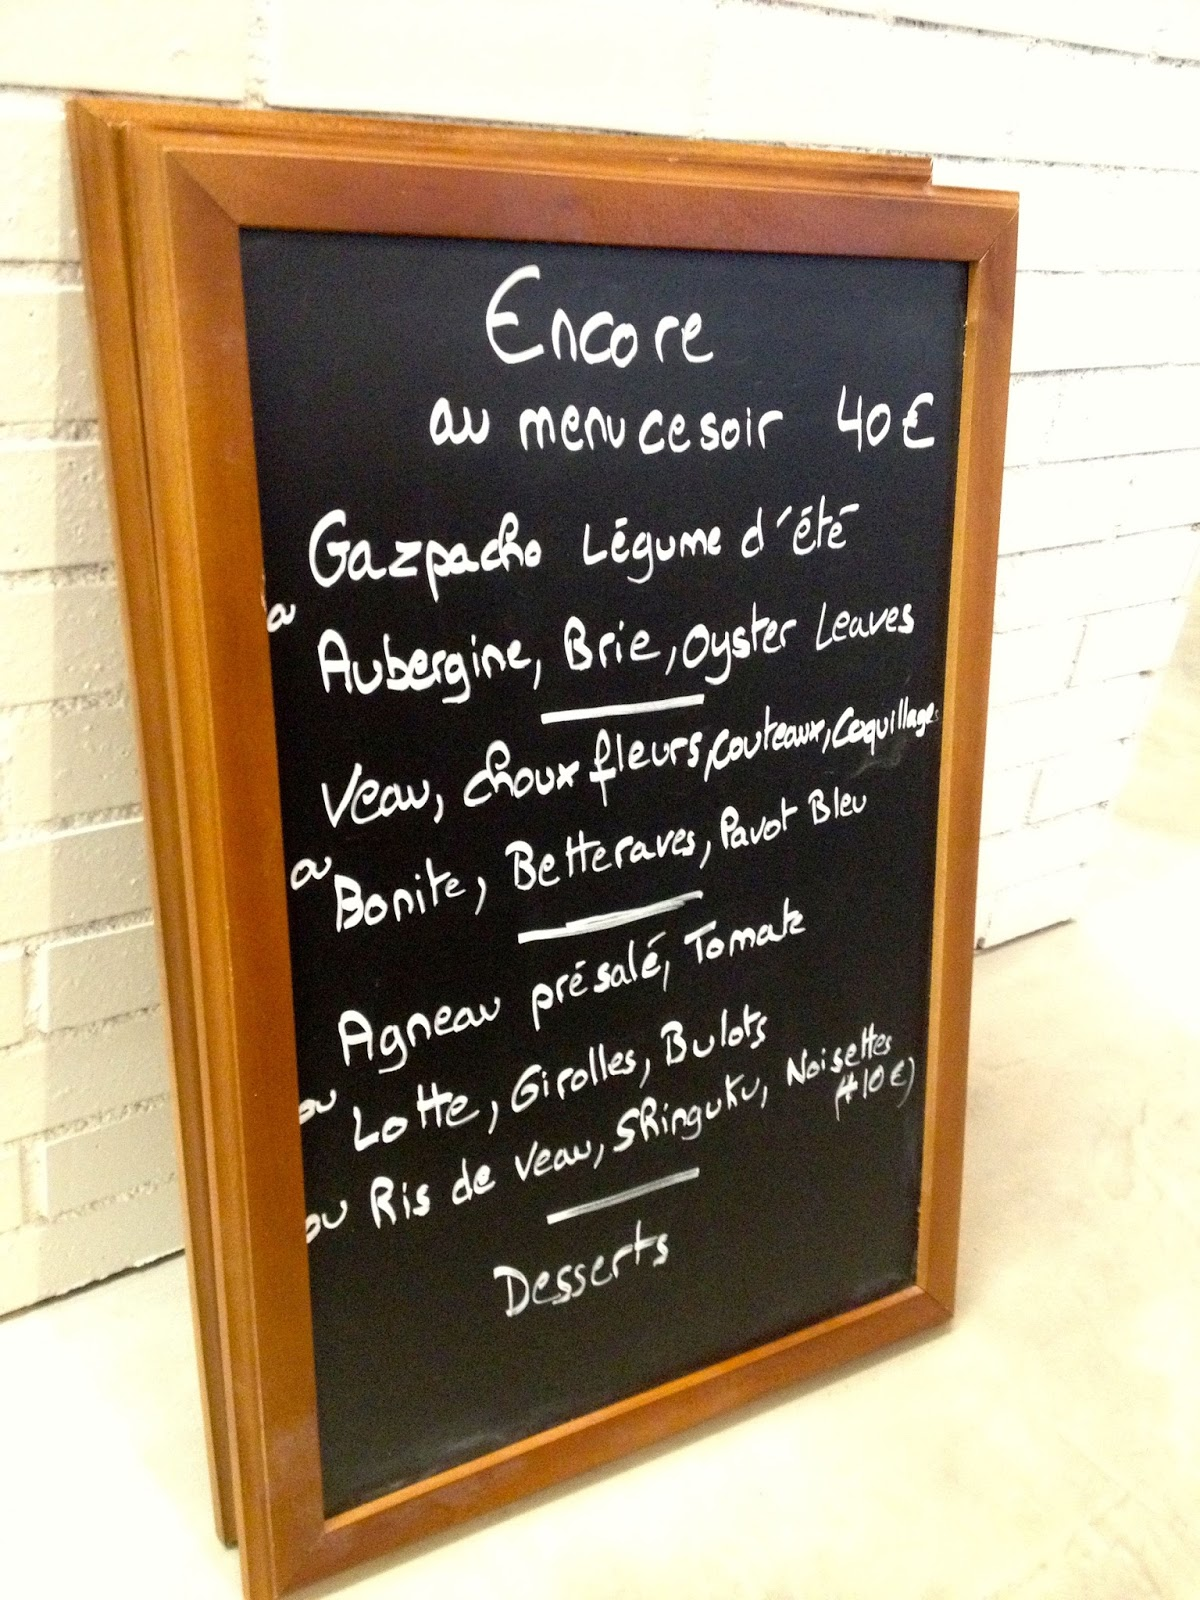 Tables 2 20 search results calendar 2015 for Miroir restaurant paris menu